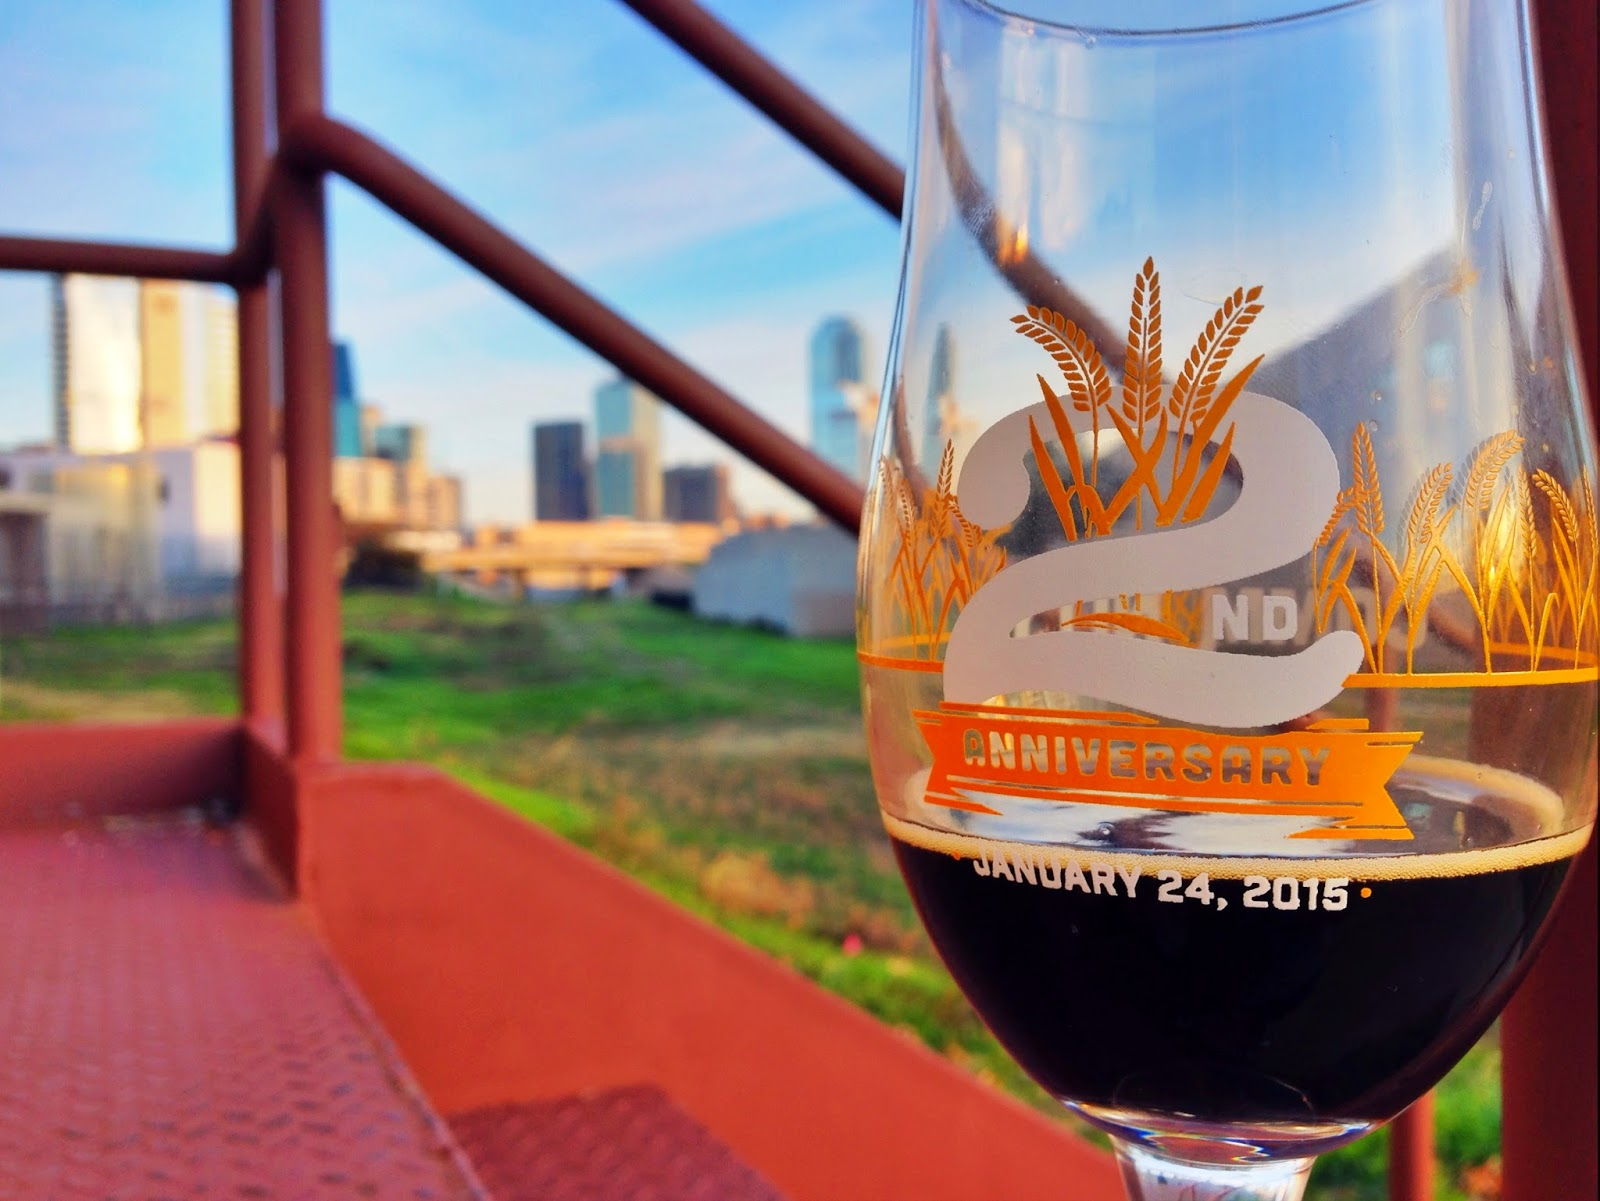 Community beer company 2nd anniversary